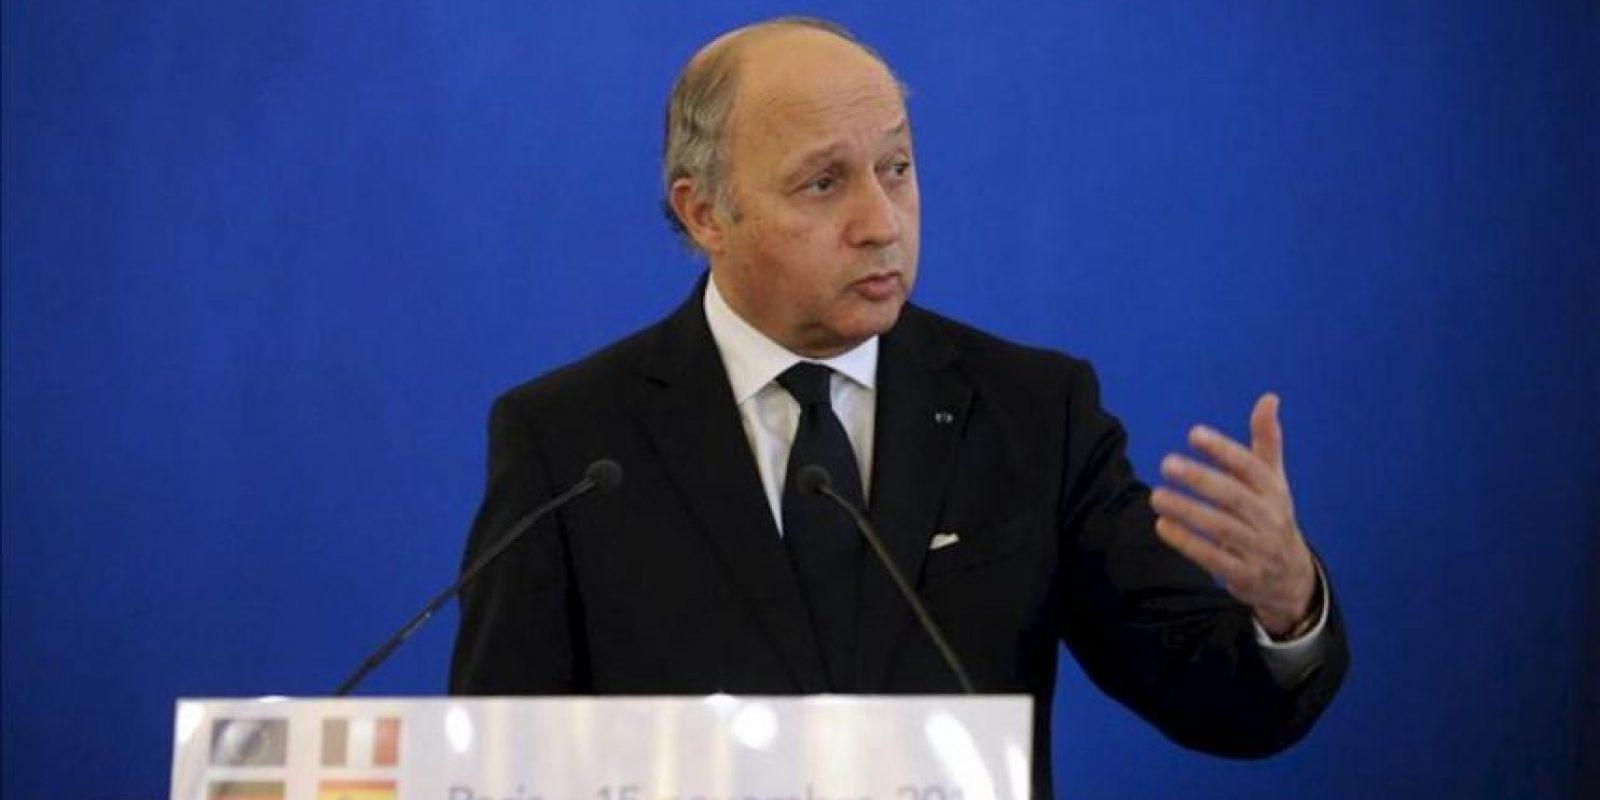 Imagen de archivo del ministro de Exteriores francés, Laurent Fabius. EFE/Archivo